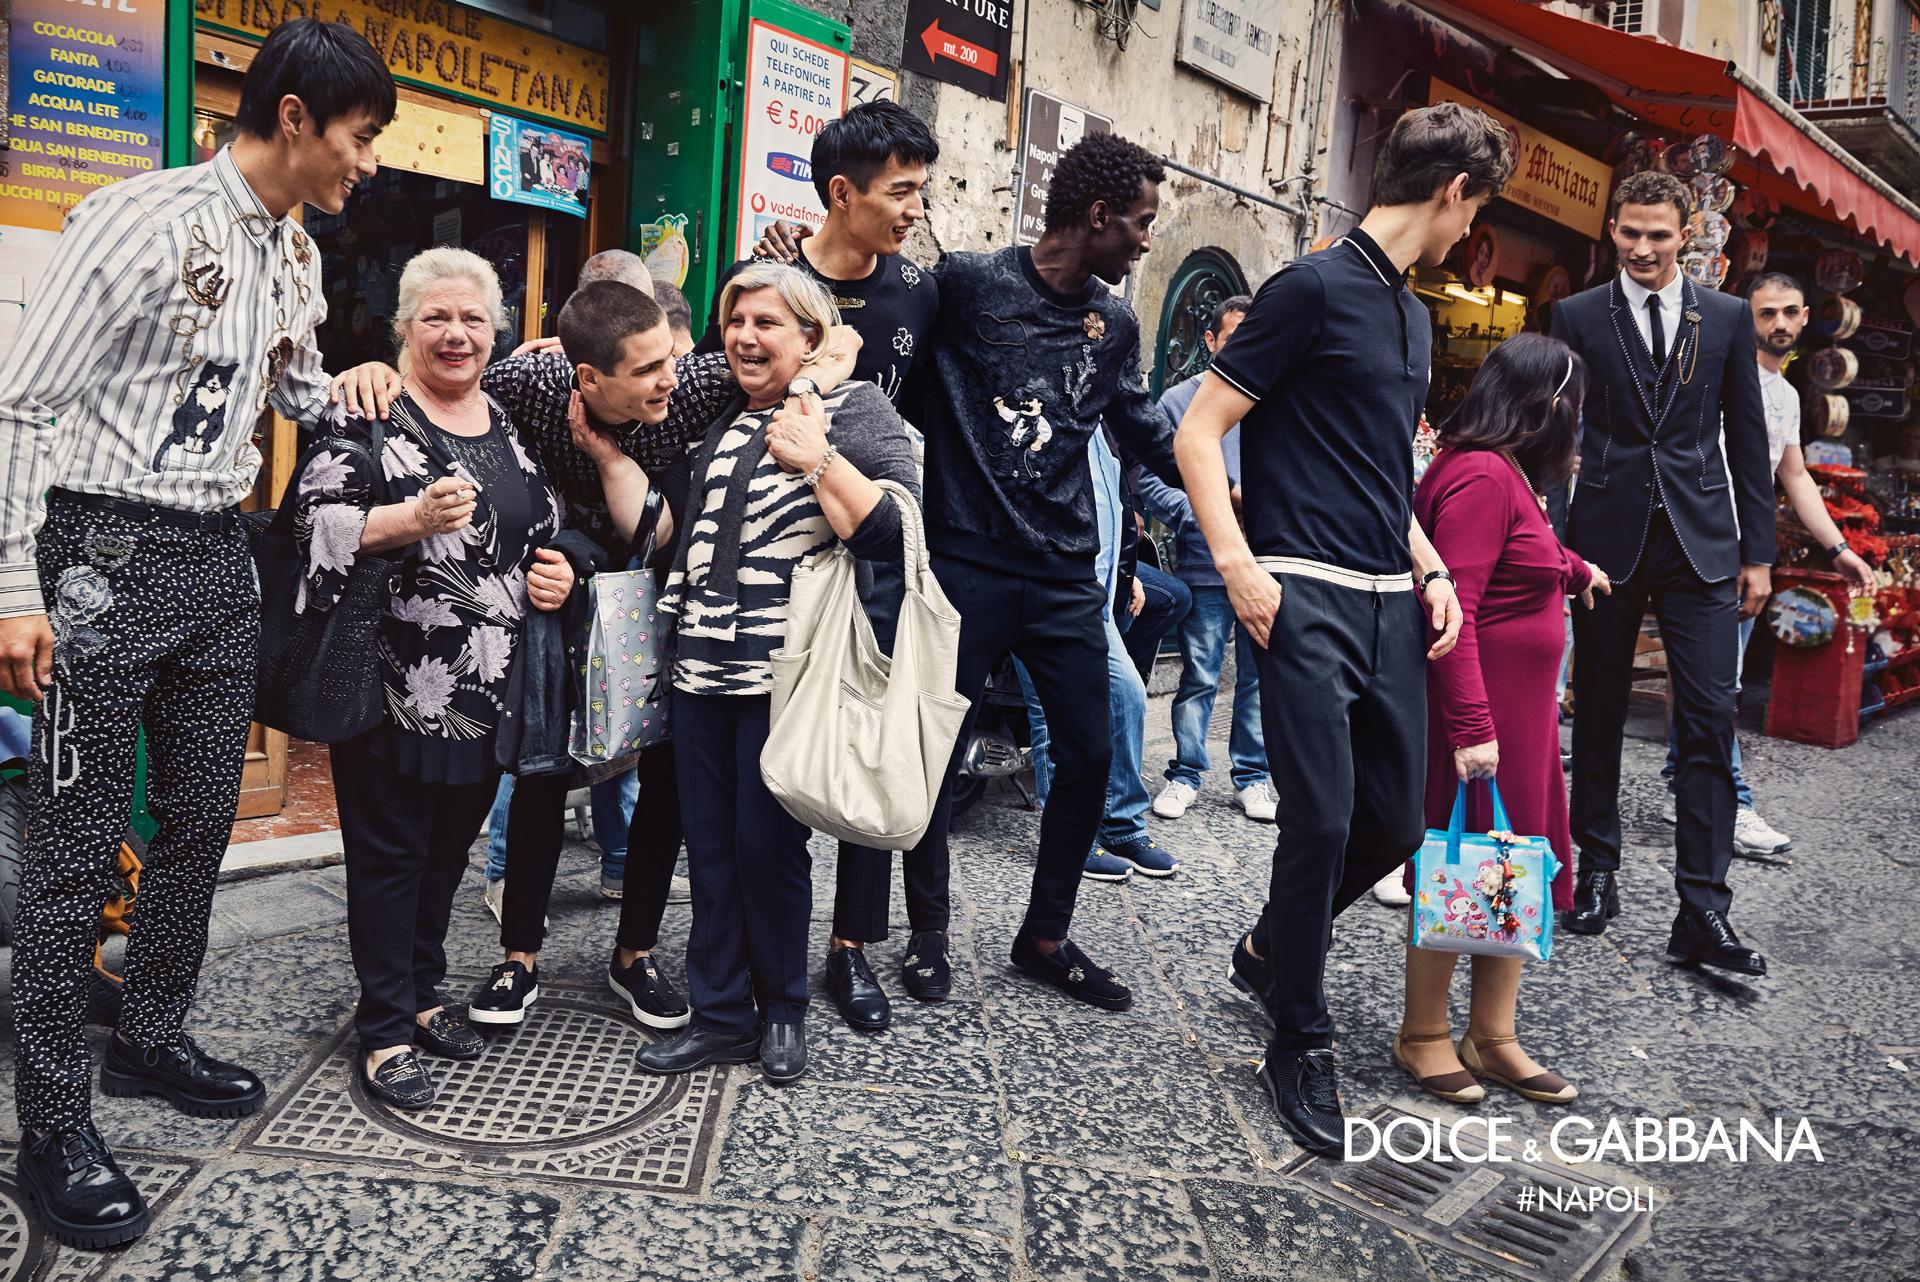 Dolce-Gabbana-Fall-Winter-2016-2017-Ad-Campaign-Naples-10